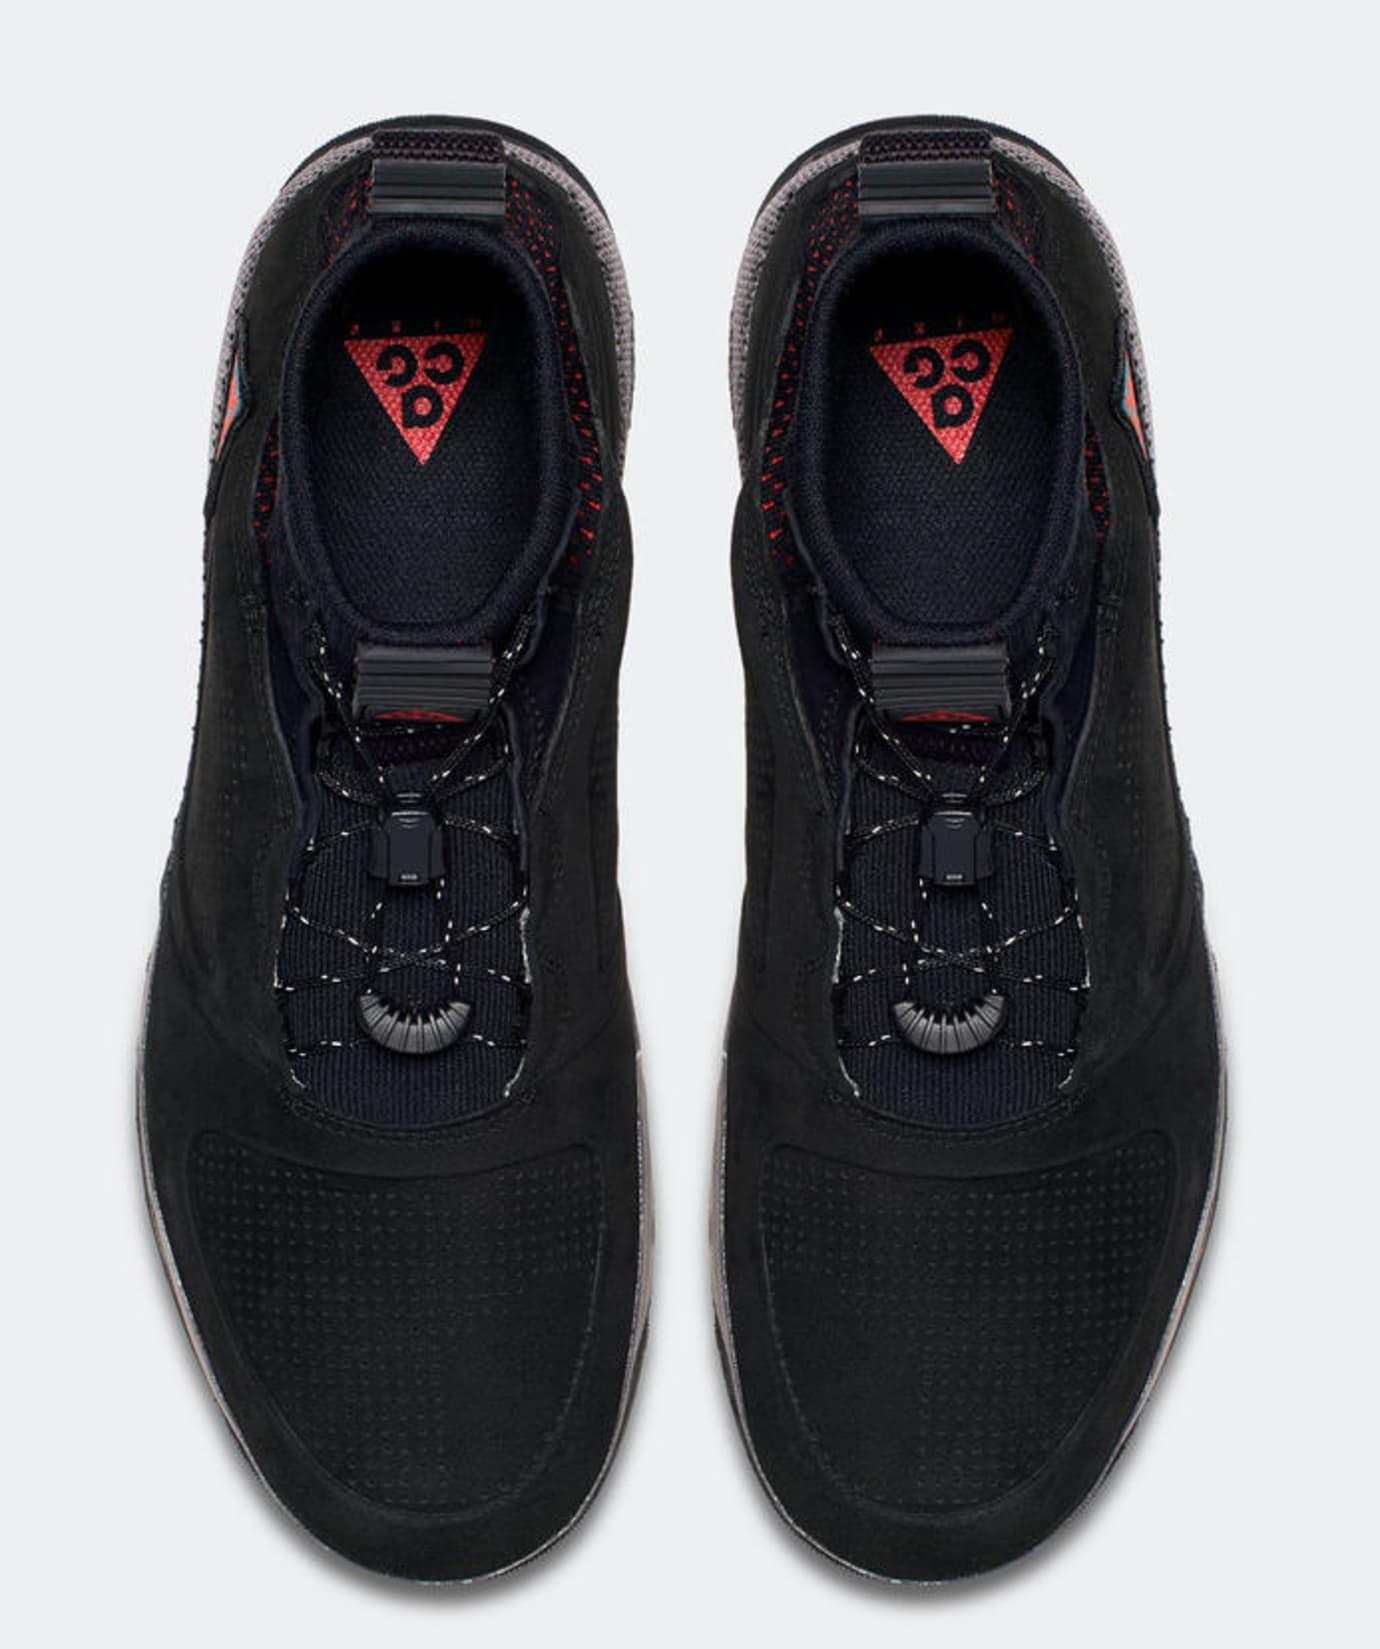 Nike ACG Ruckel Ridge 'Black' (Top)